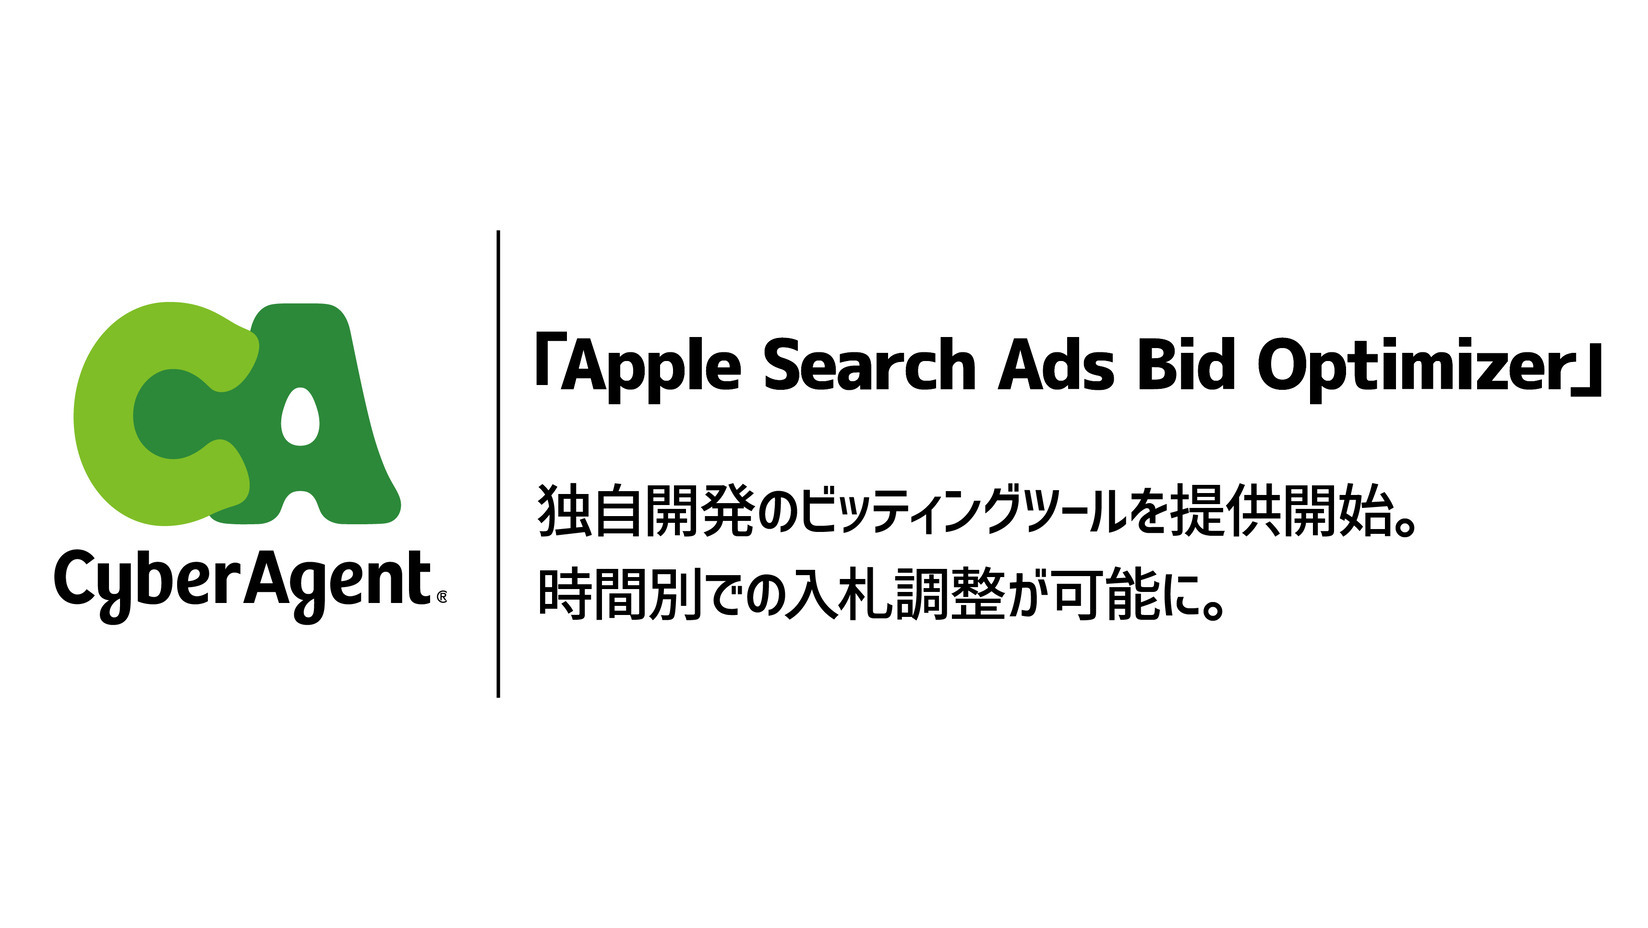 Apple Search Ads Bid Optimizer